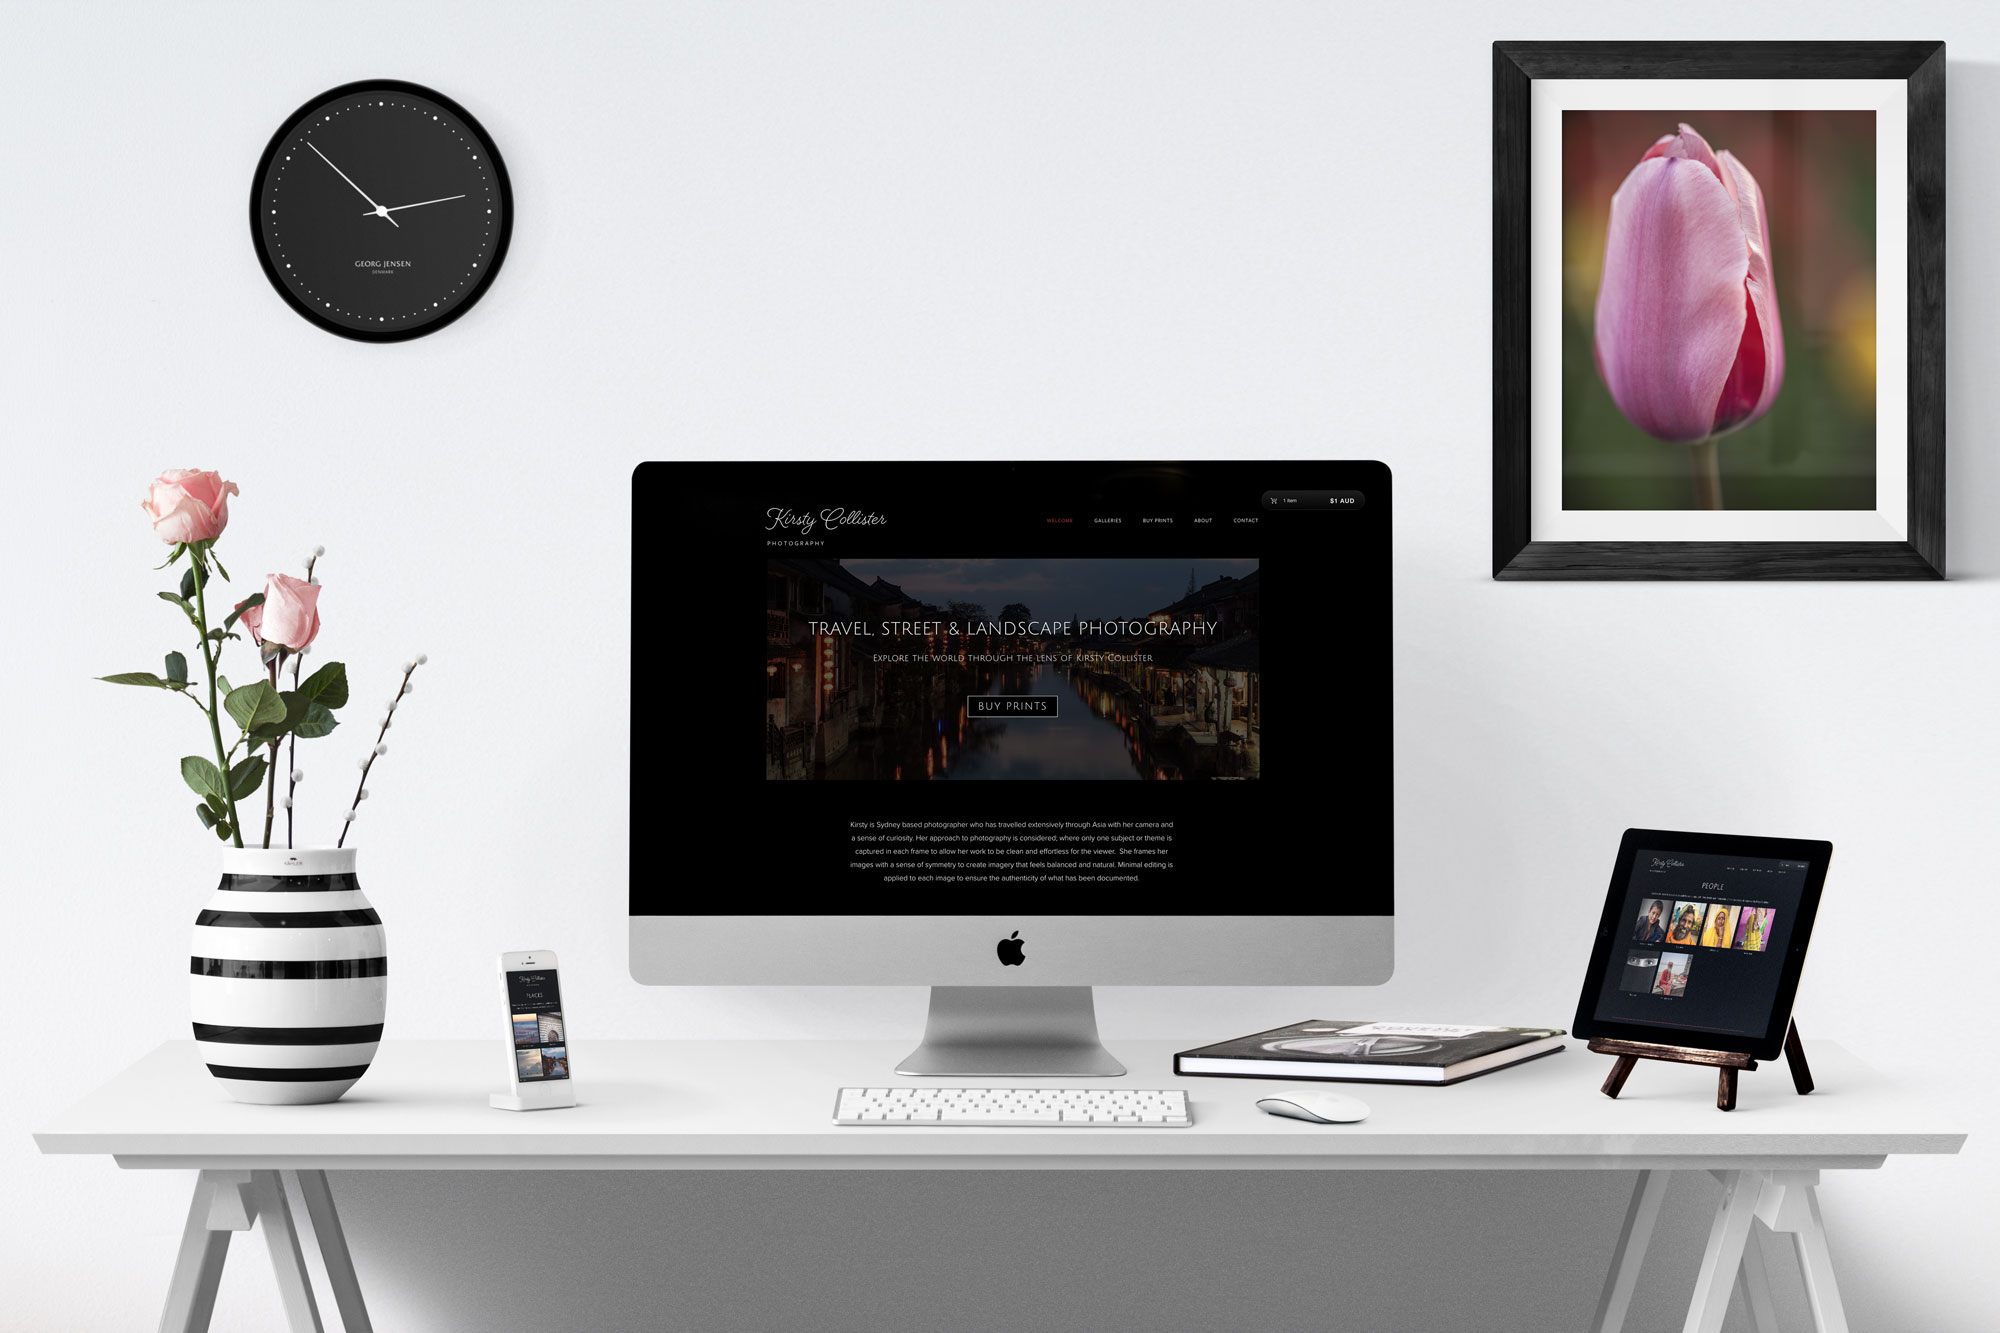 kirstyphotography_website_design.jpg